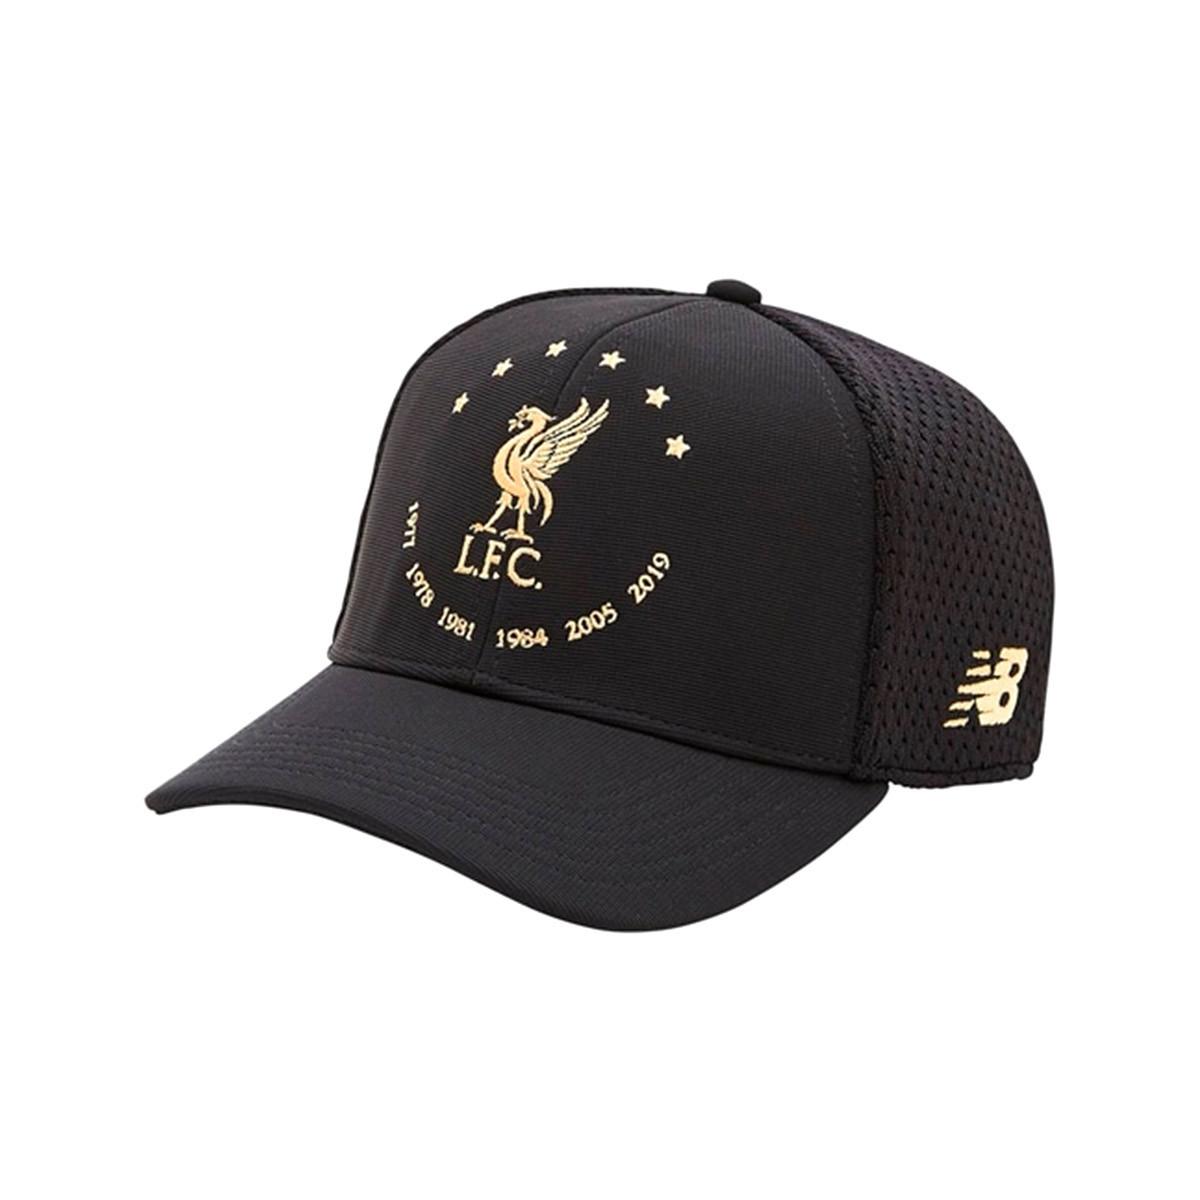 Cap New Balance Liverpool Fc 6 Times Ed Signature 2019 2020 Black Gold Football Store Futbol Emotion